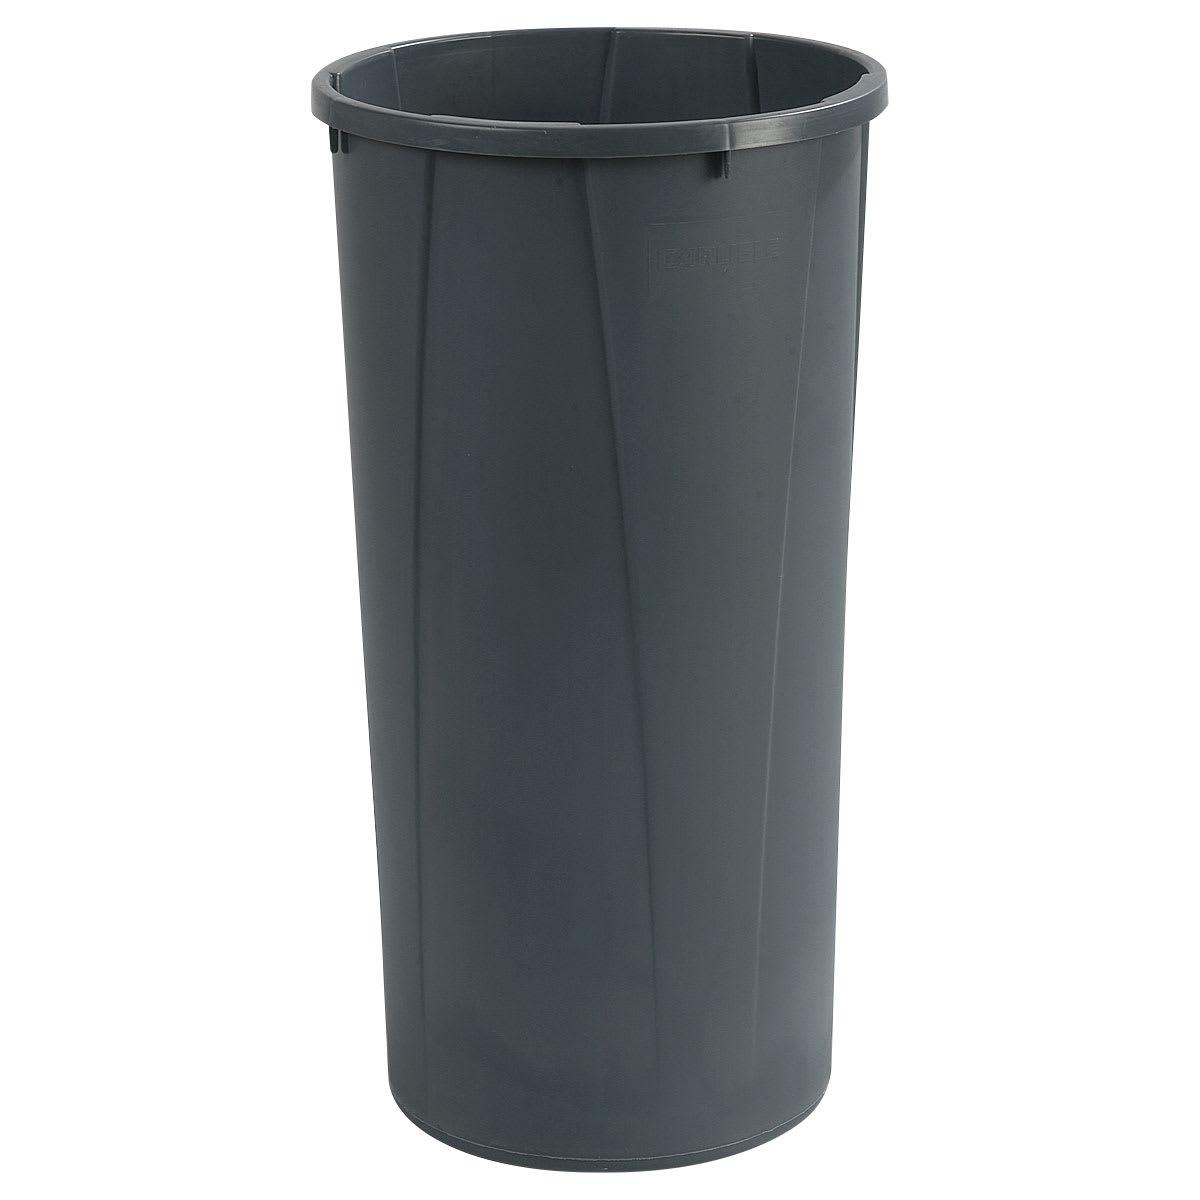 Carlisle 34312223 22 Gallon Commercial Trash Can Plastic